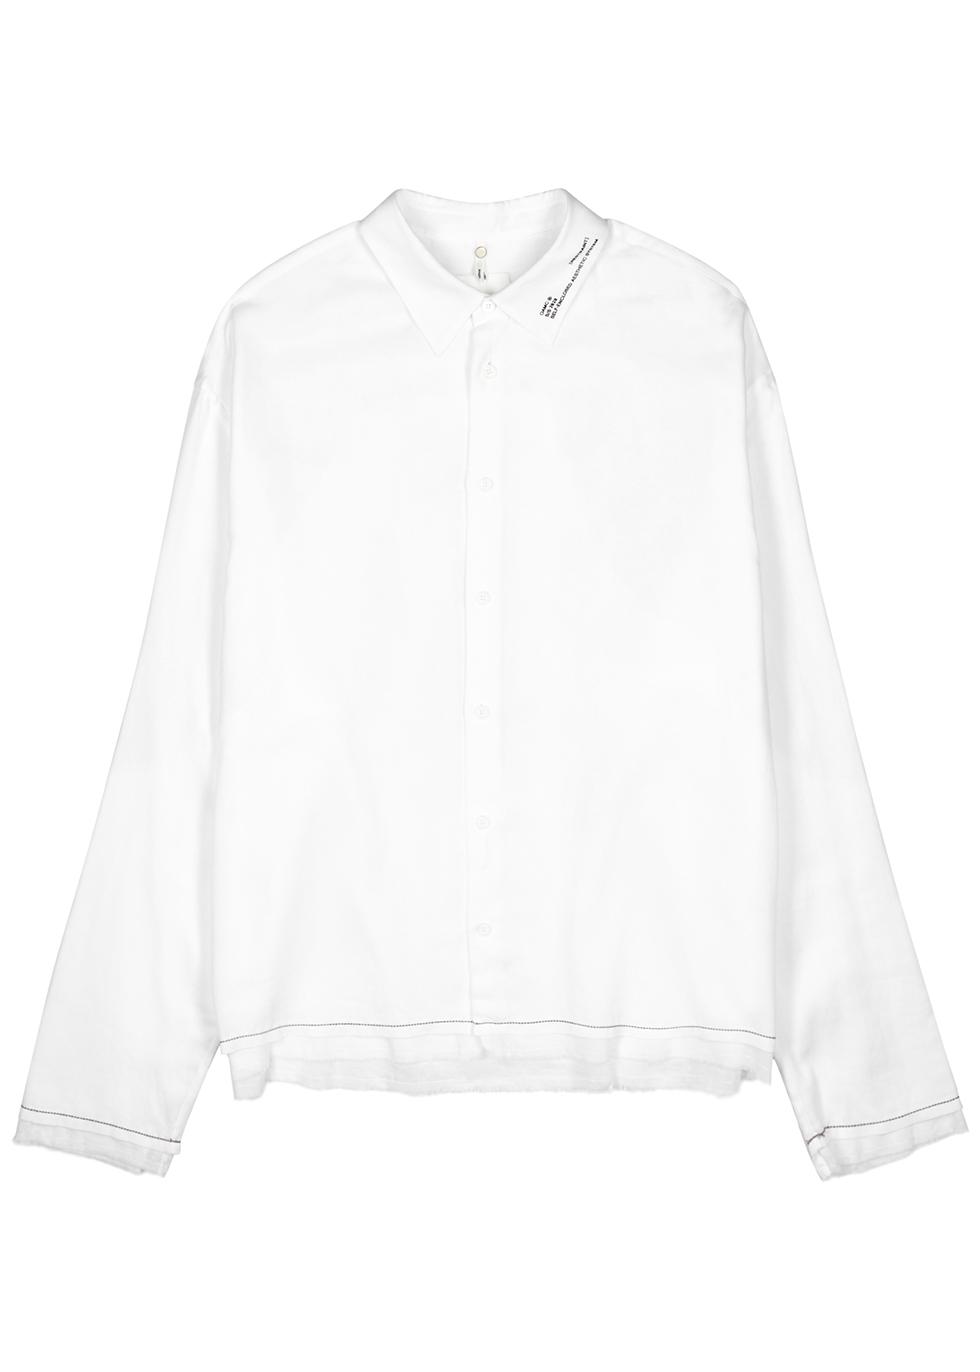 Haze white printed cotton shirt